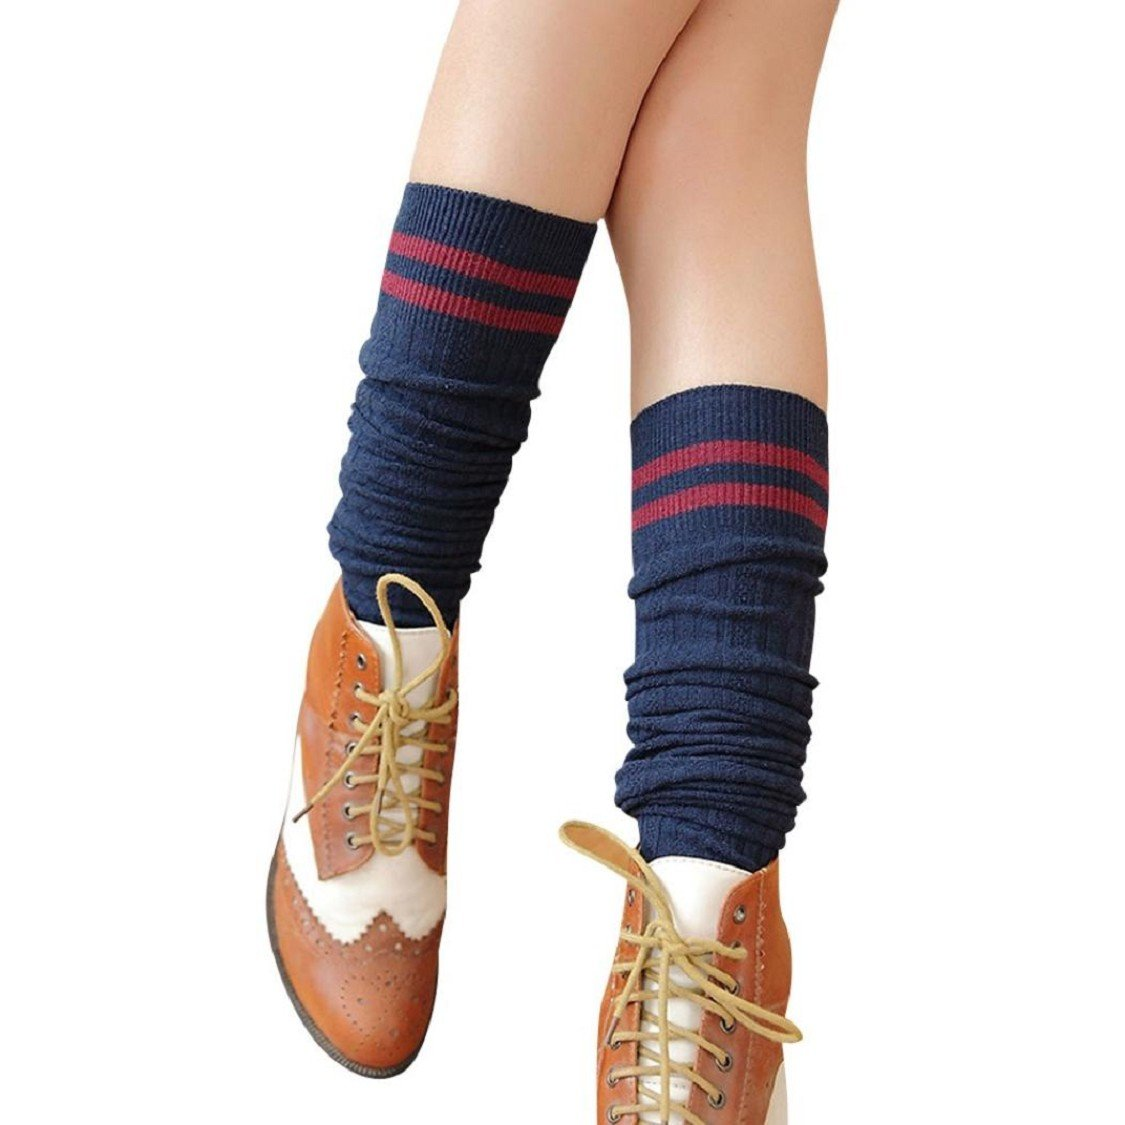 Ikevan Women Girls Thigh High Over The Knee Socks College Wind Warm Soft Knit Cotton Stockings Long Boot Socks Autumn Winter (Black)